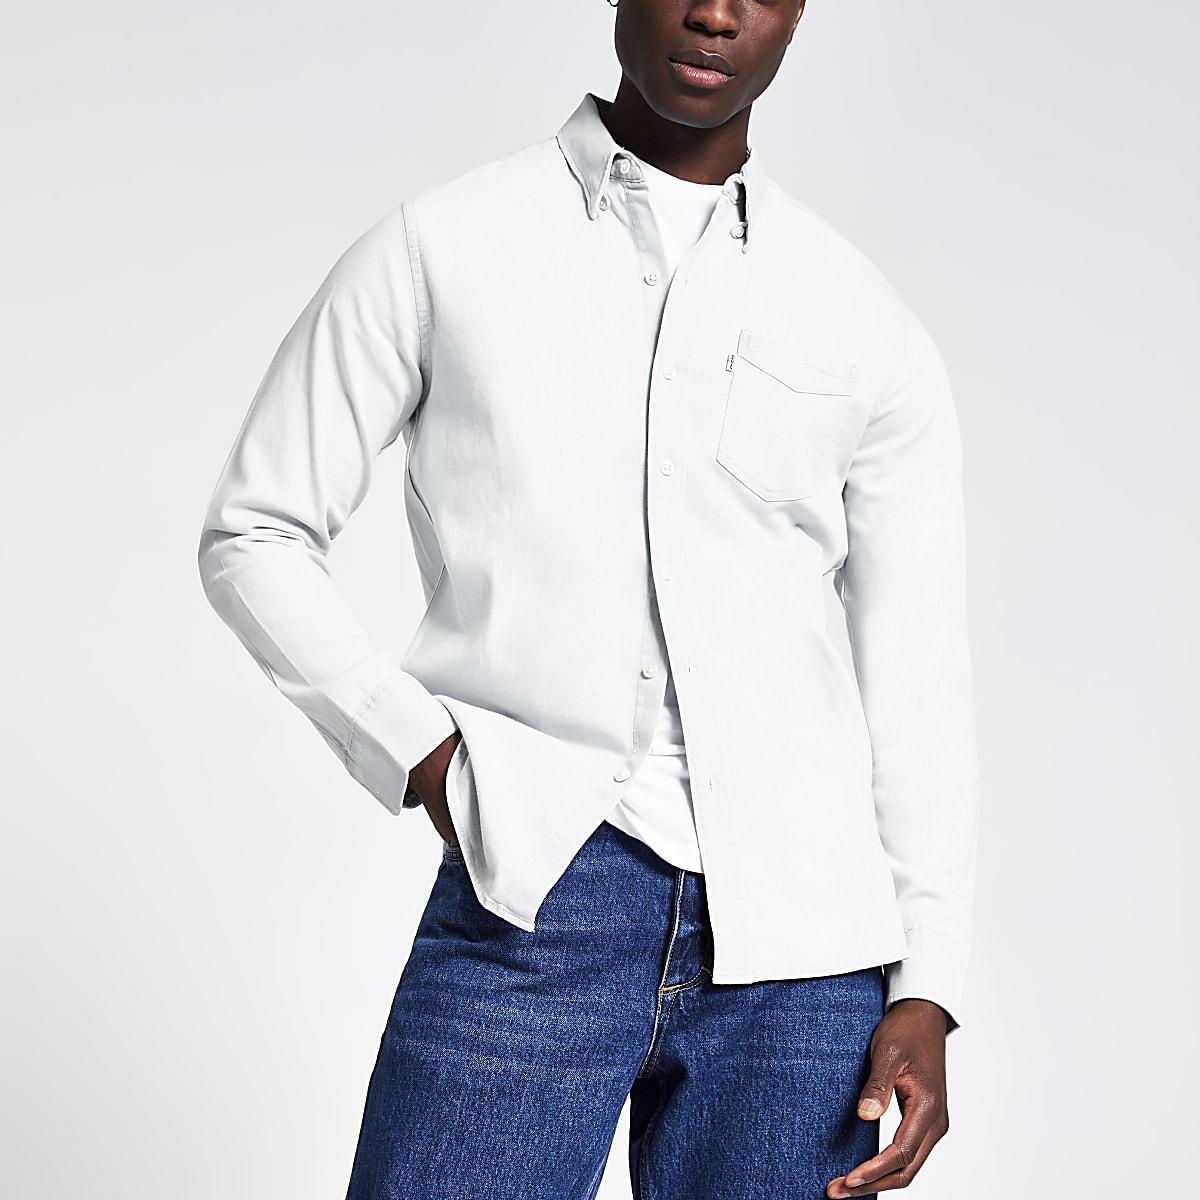 Levi's light blue denim shirt